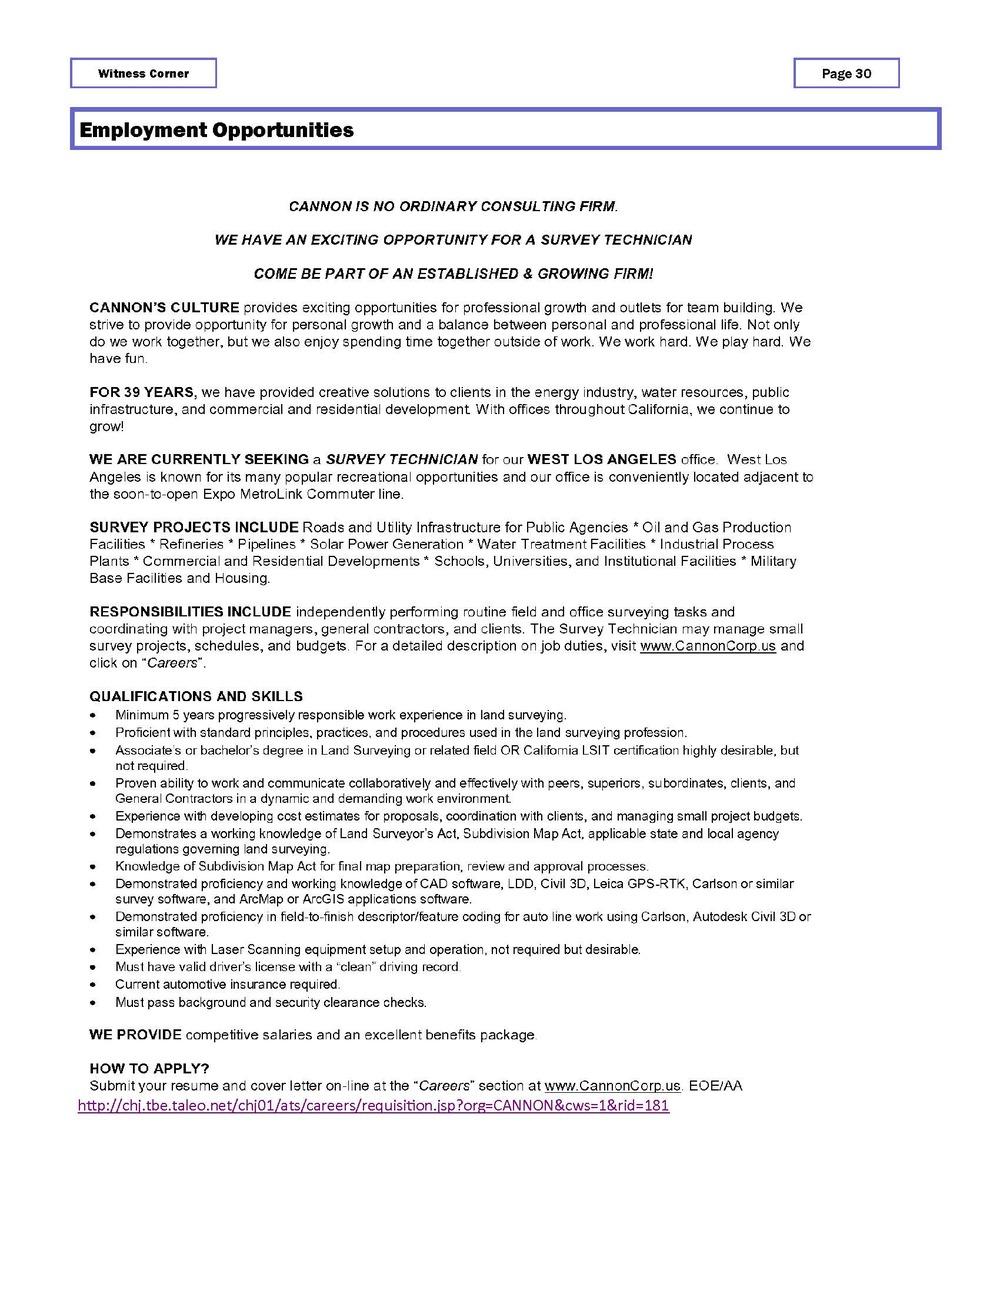 OC-CLSA 082015 Newsletter_Page_36.jpg